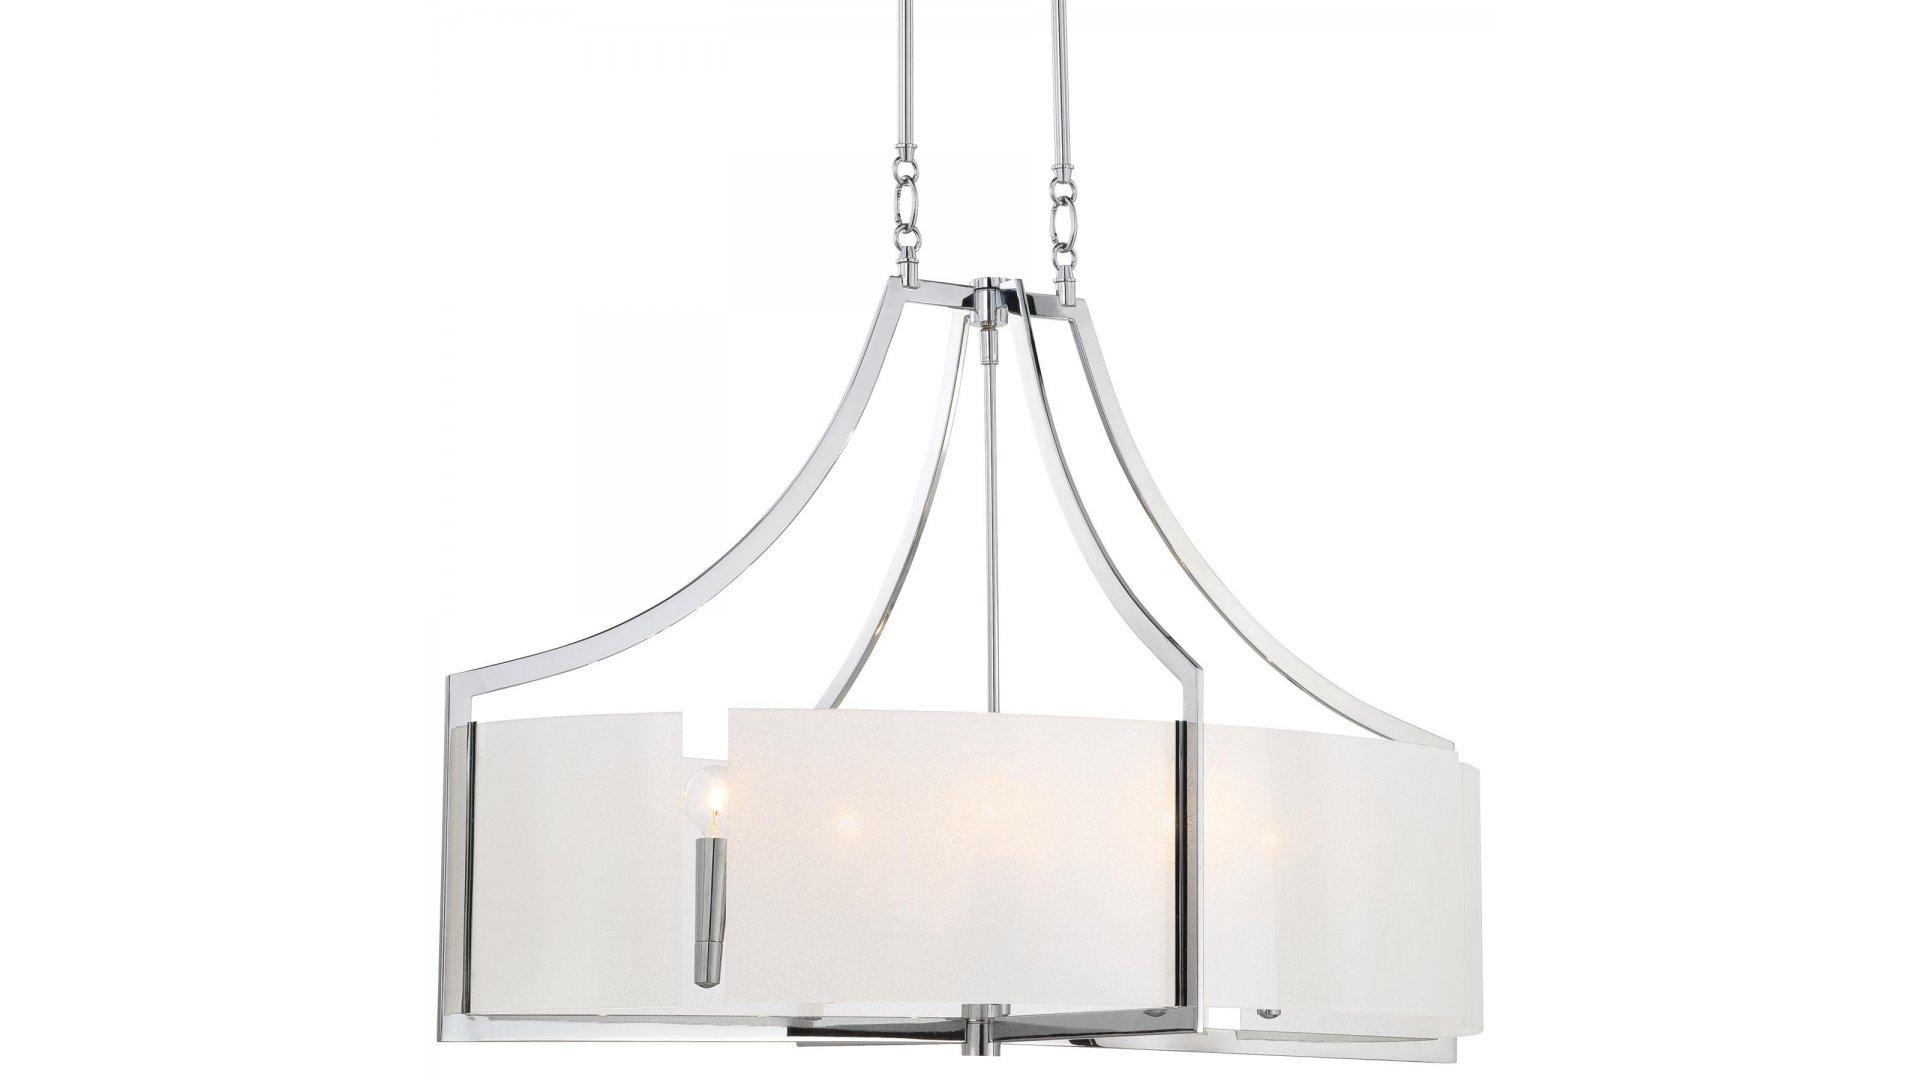 Minka Lavery Lighting Model 4398 77 Clarte 6 Light Pendant Fixture Chrome White Finish